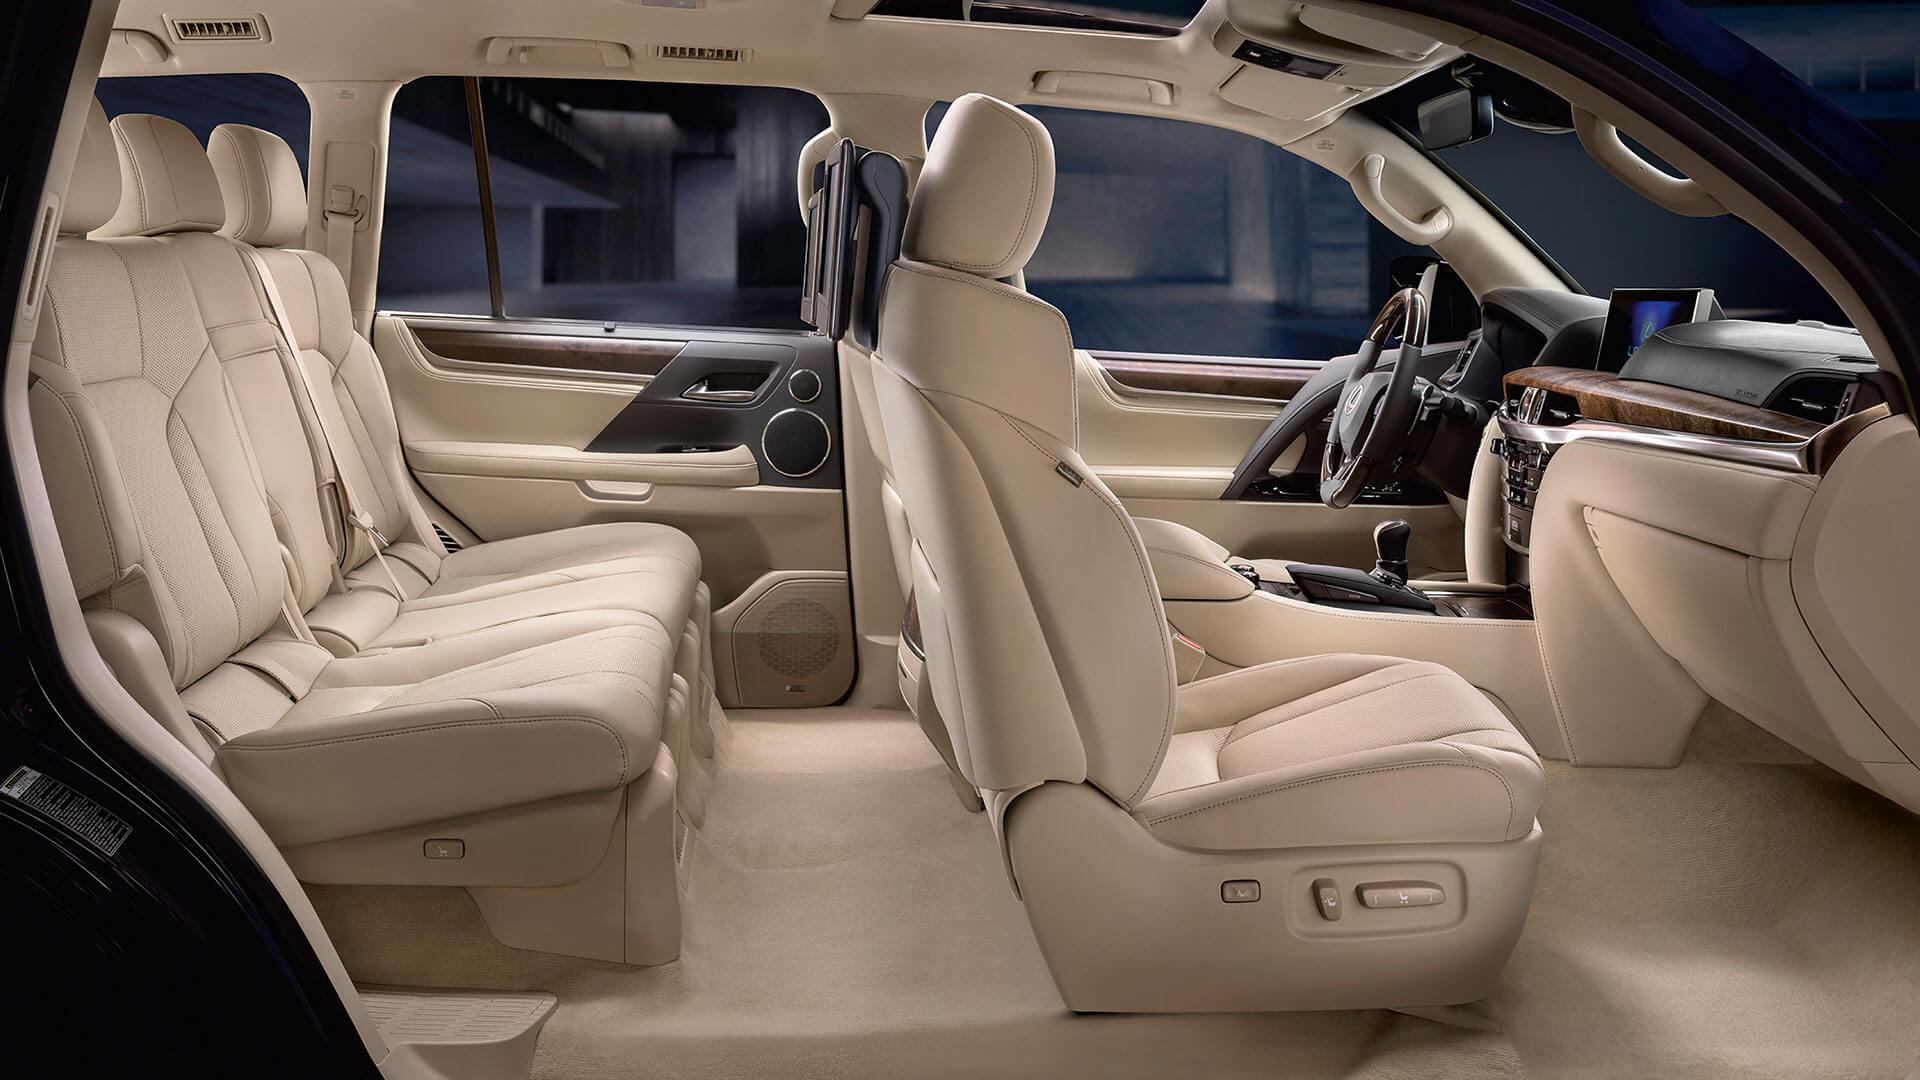 2017 lexus lx 570 features luxury cabin